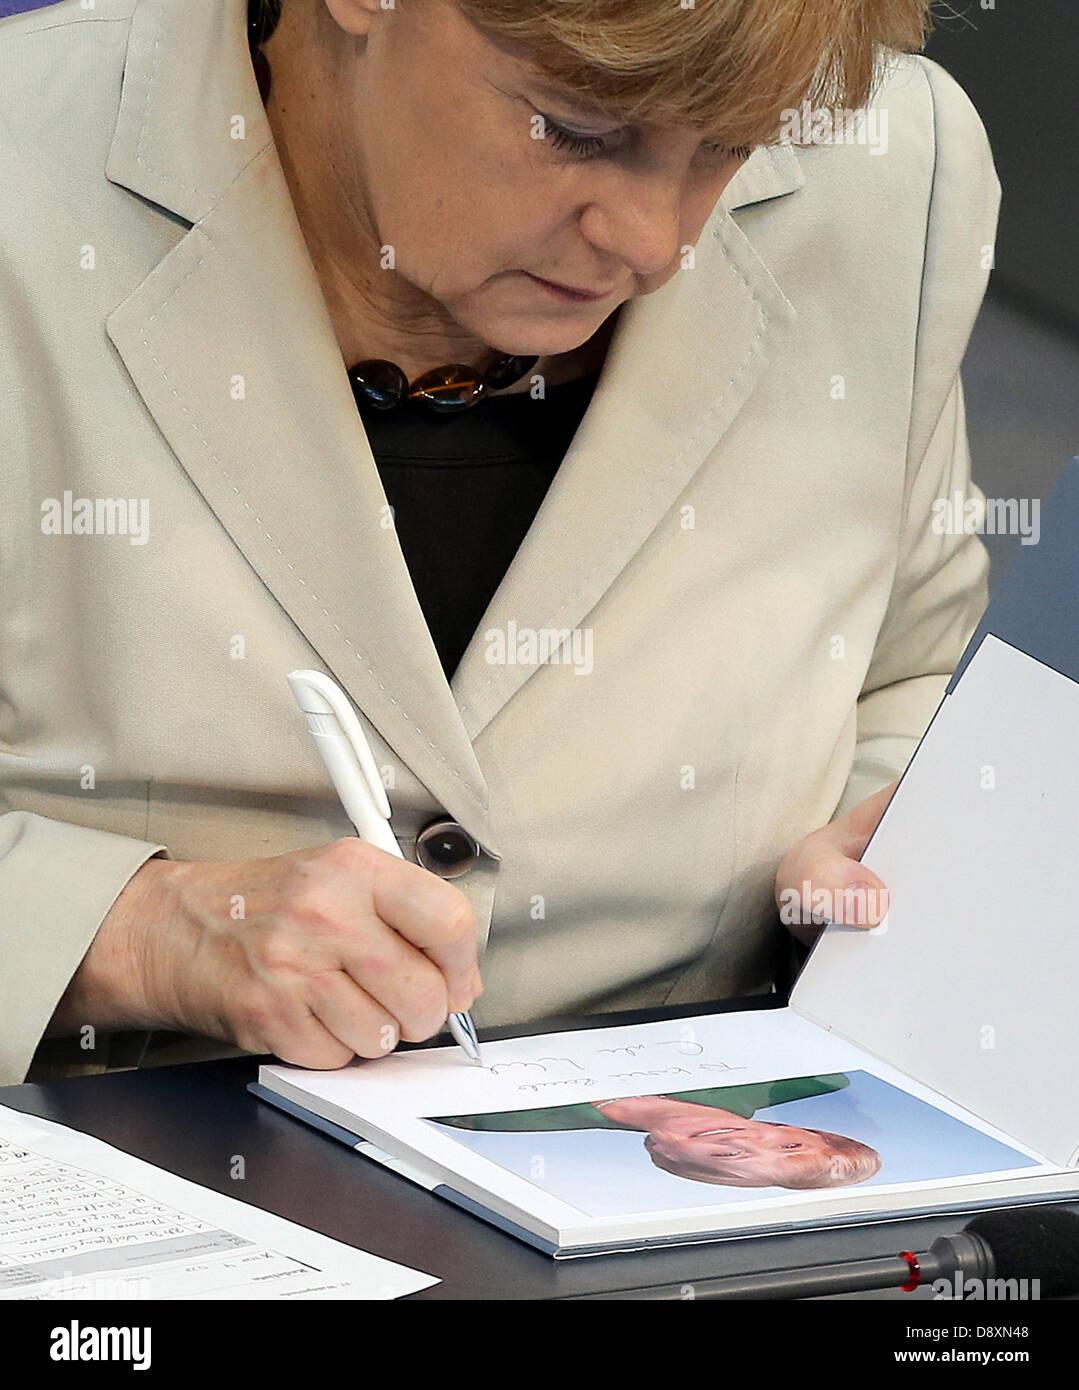 Berlin, Germany. 6th June 2013. Chancellor Angela Merkel (CDU) signs a book in the German Bundestag in Berlin, Germany, - Stock Image